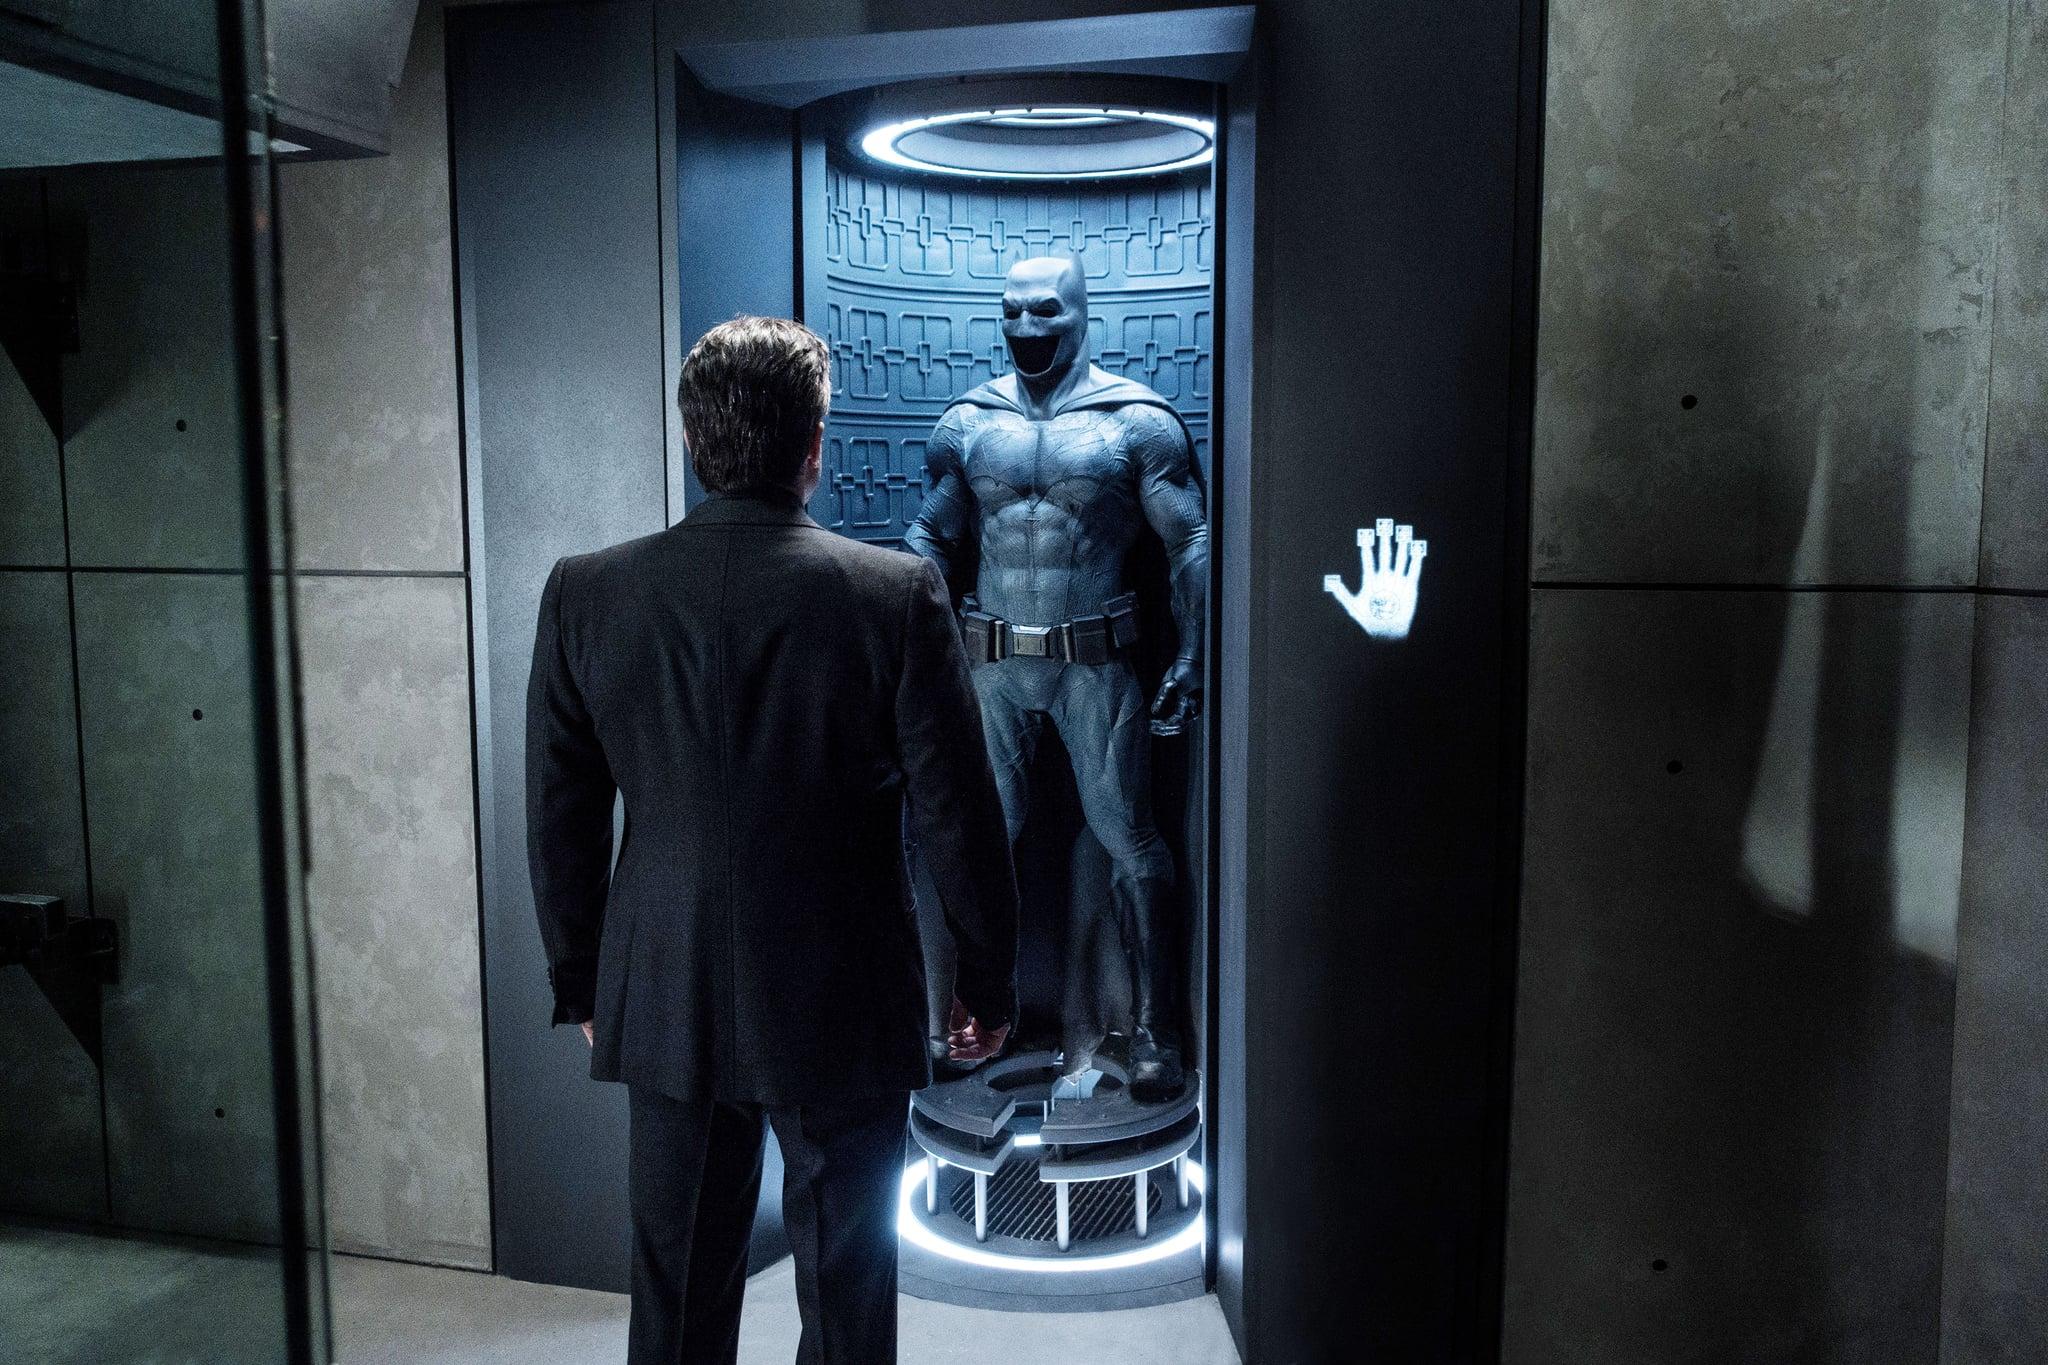 BATMAN V SUPERMAN: DAWN OF JUSTICE, Ben Affleck at Bruce Wayne/Batman, 2016. ph: Clay Enos /  Warner Bros. / courtesy Everett Collection